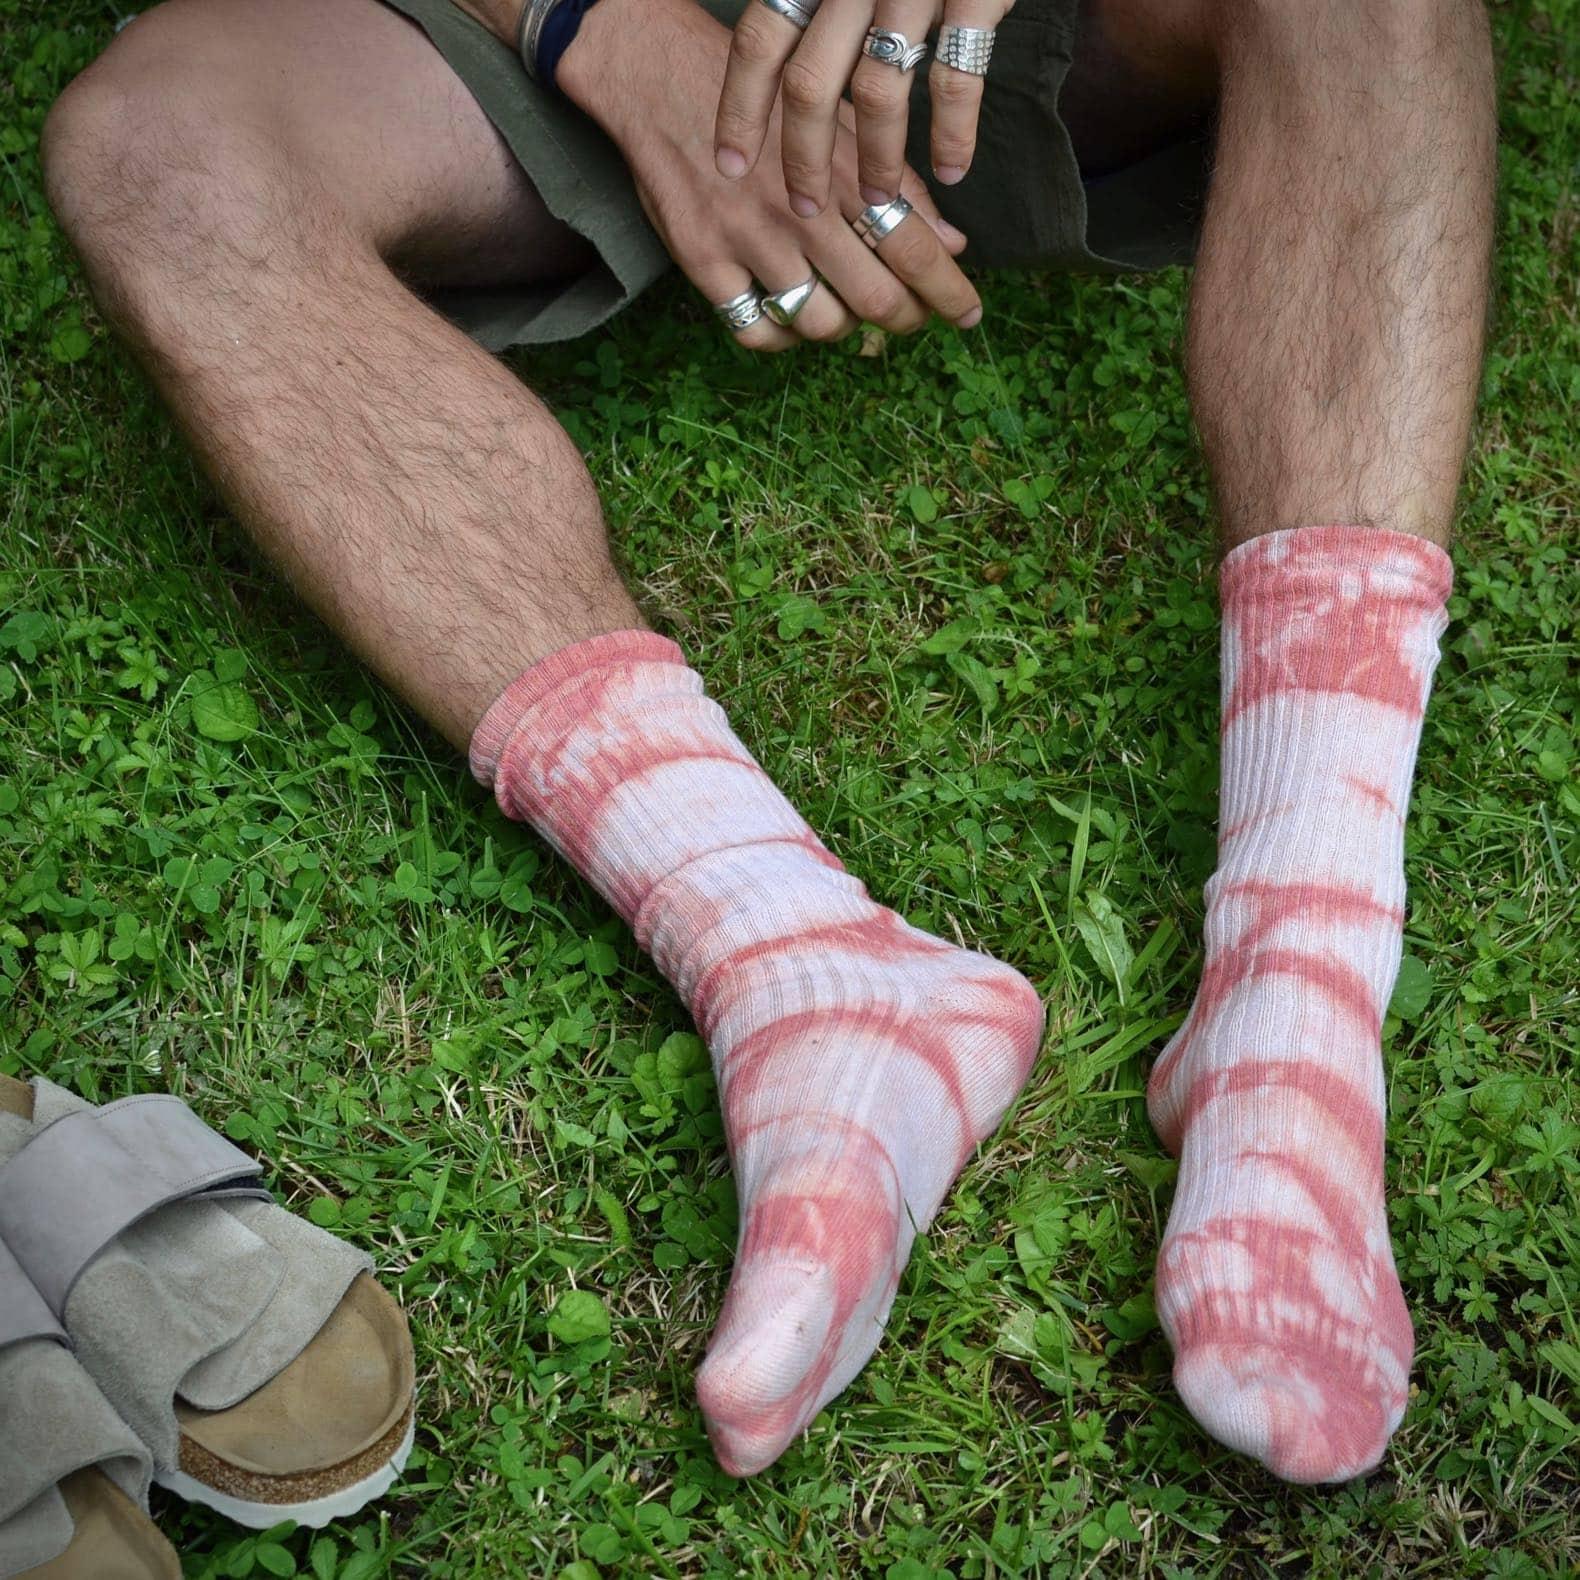 chaussettes royalties tie and dye et birkenstock kyoto